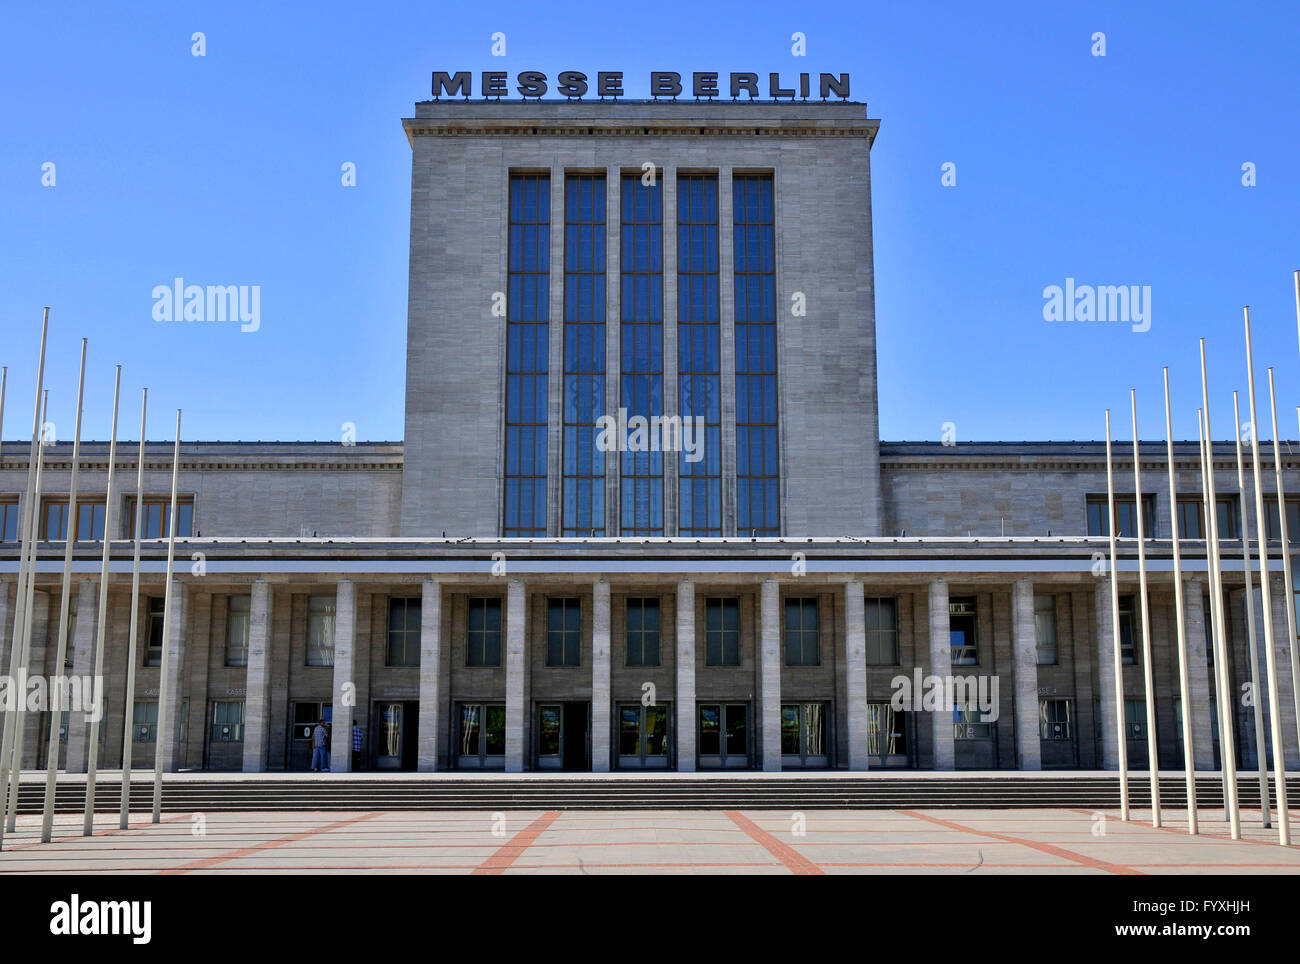 Ibis Hotel Messe Berlin